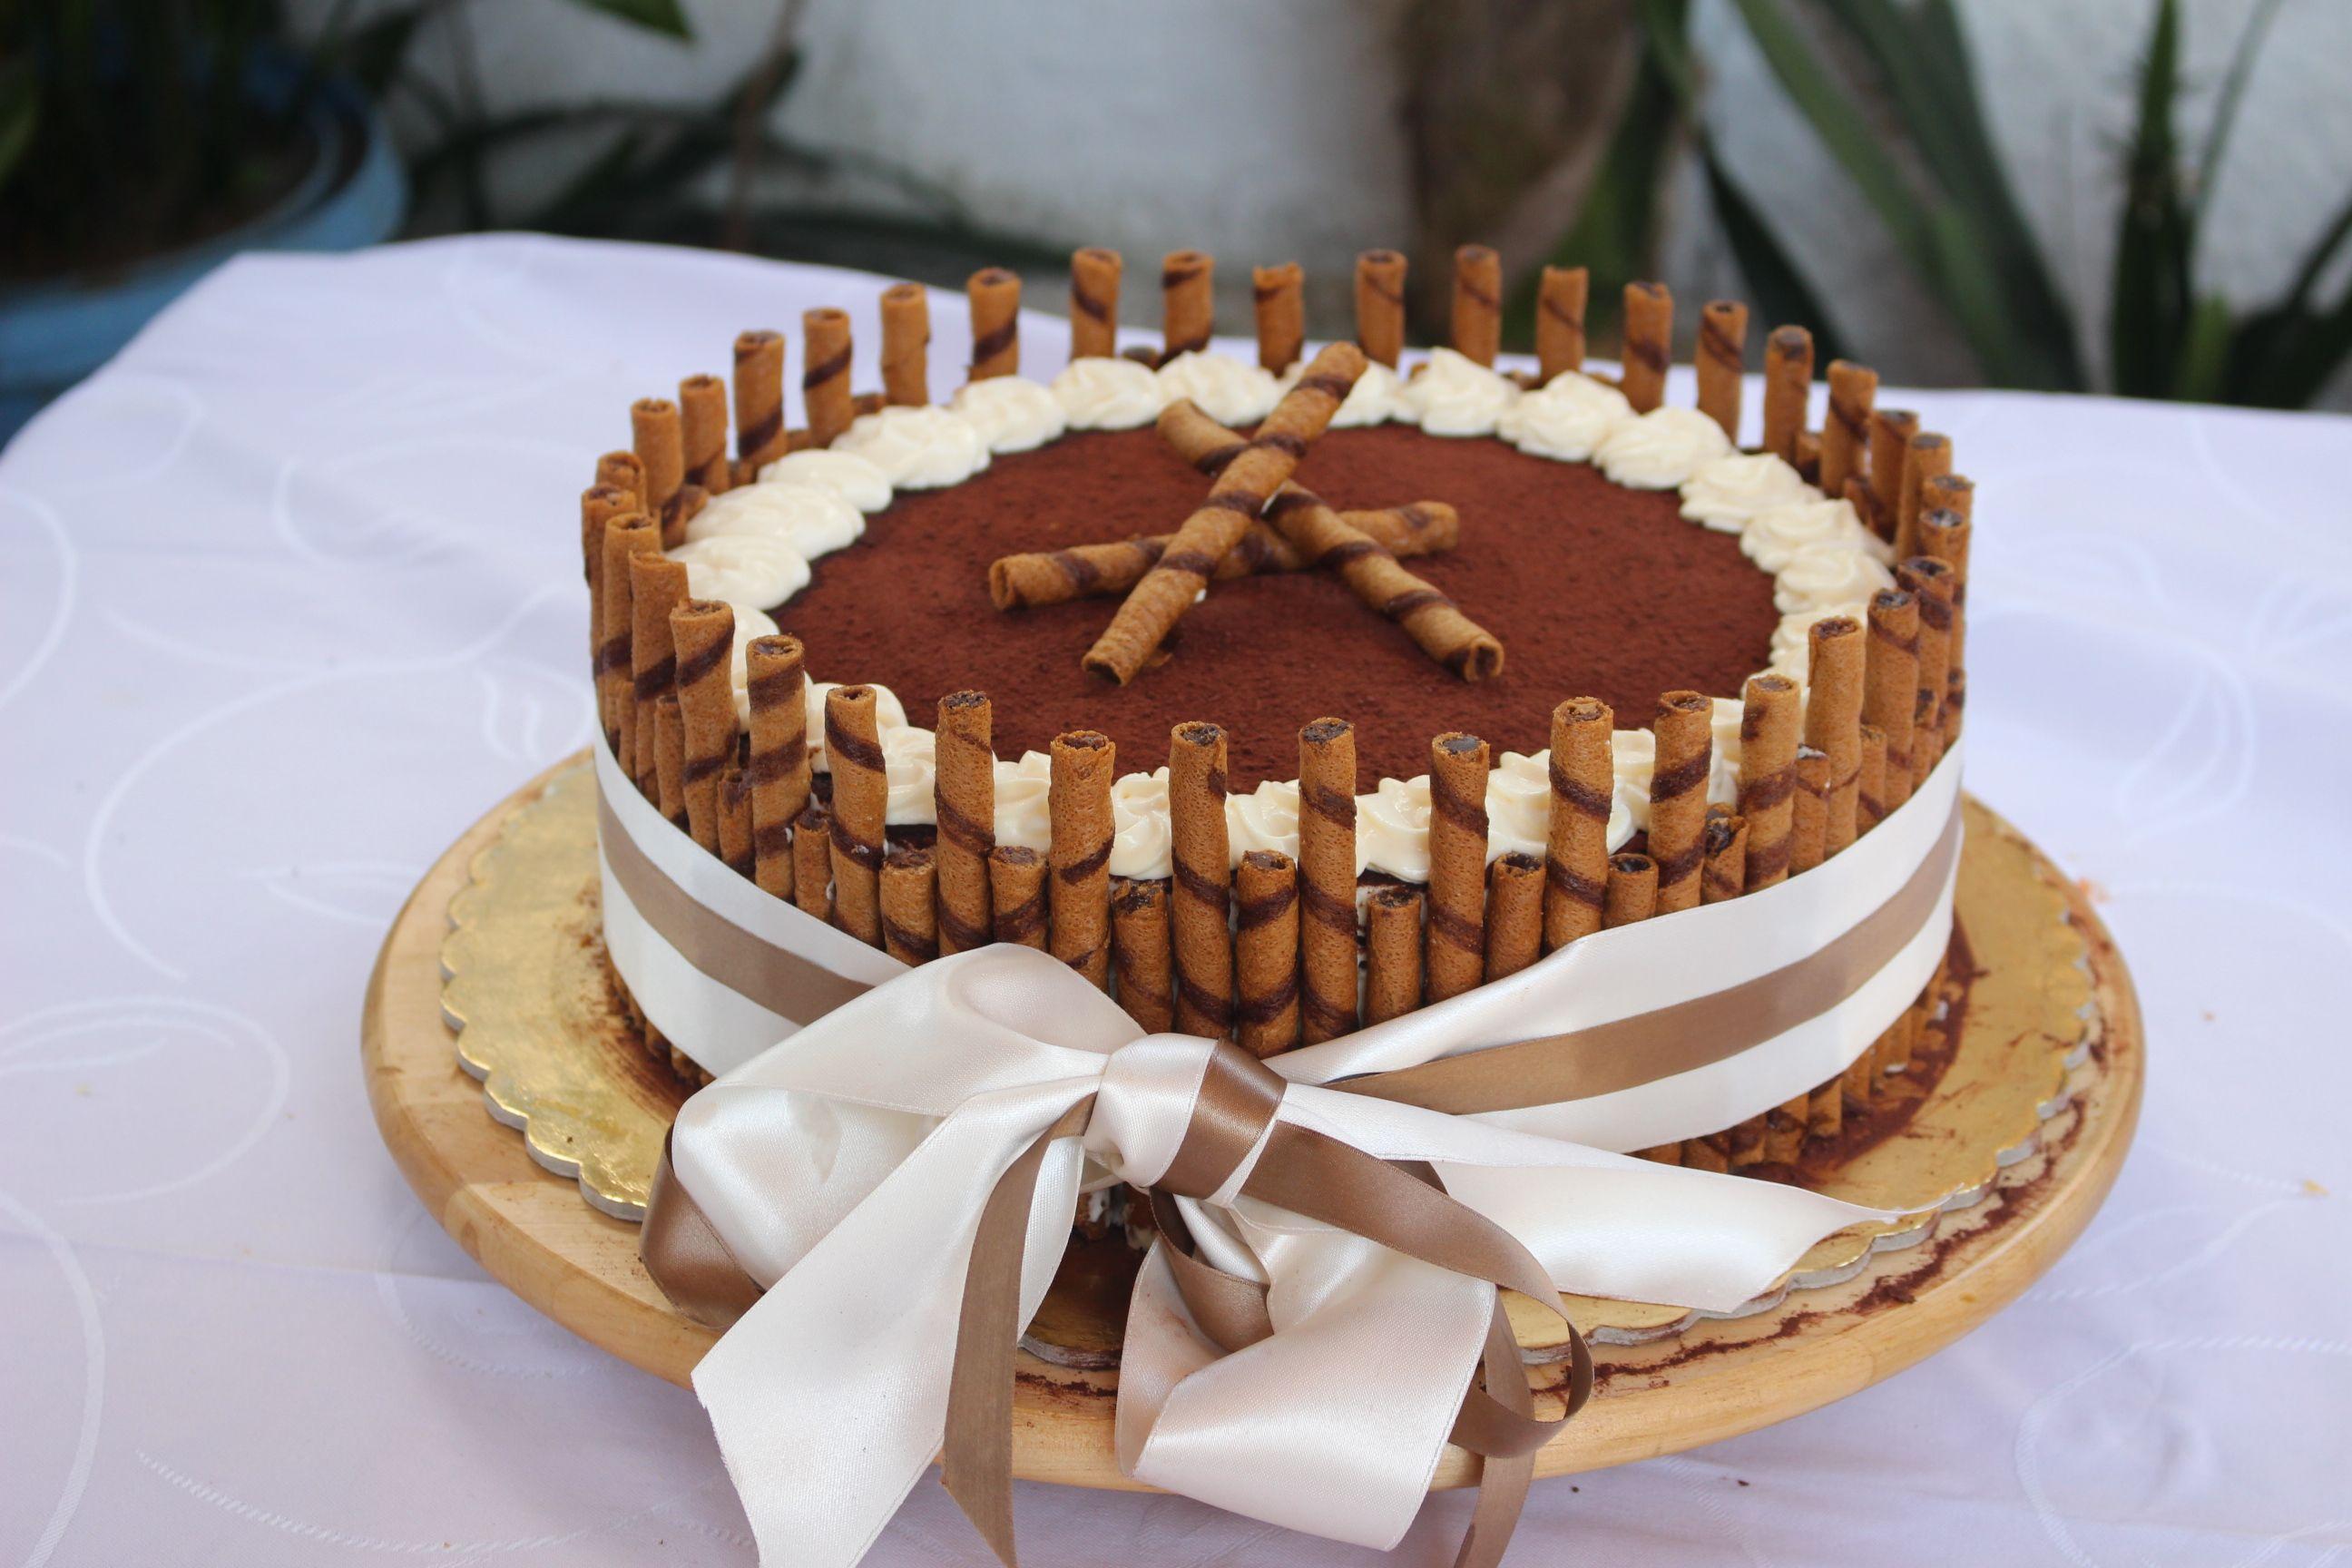 Ricetta Tiramisu Per Torta.Torta Tiramisu Dolci Peccati Di Gola Ricette Dolci Dolci Torte